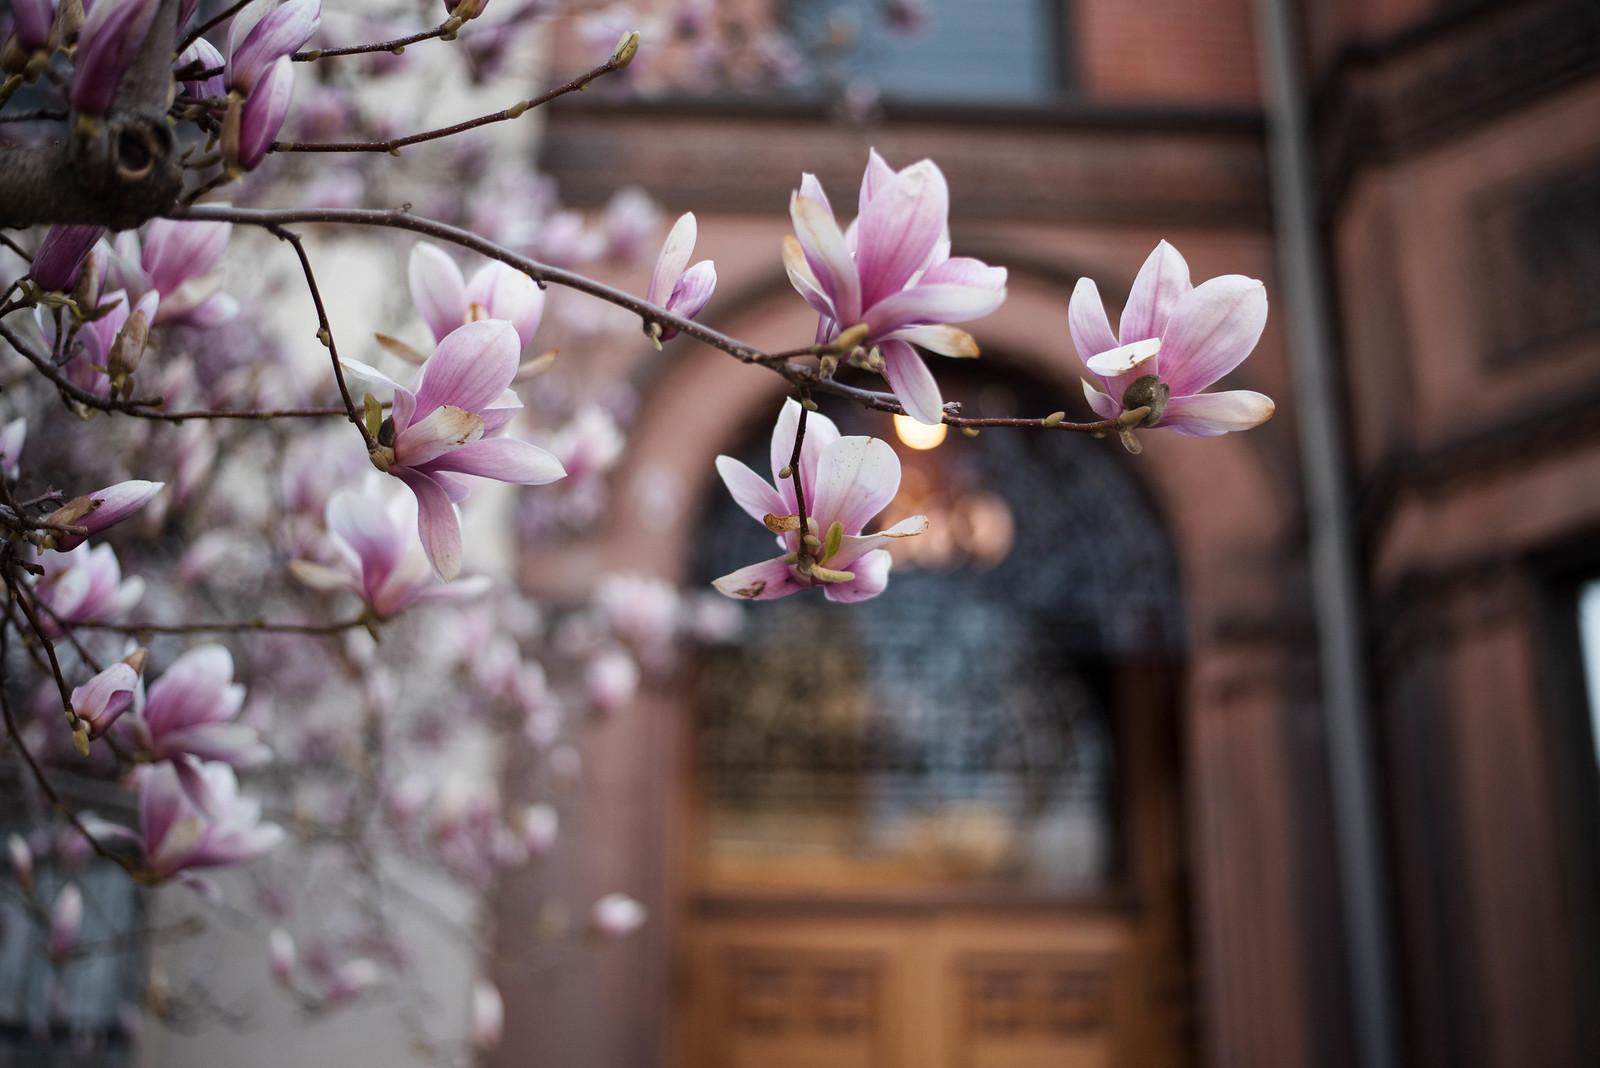 Boston Brownstones and Magnolias